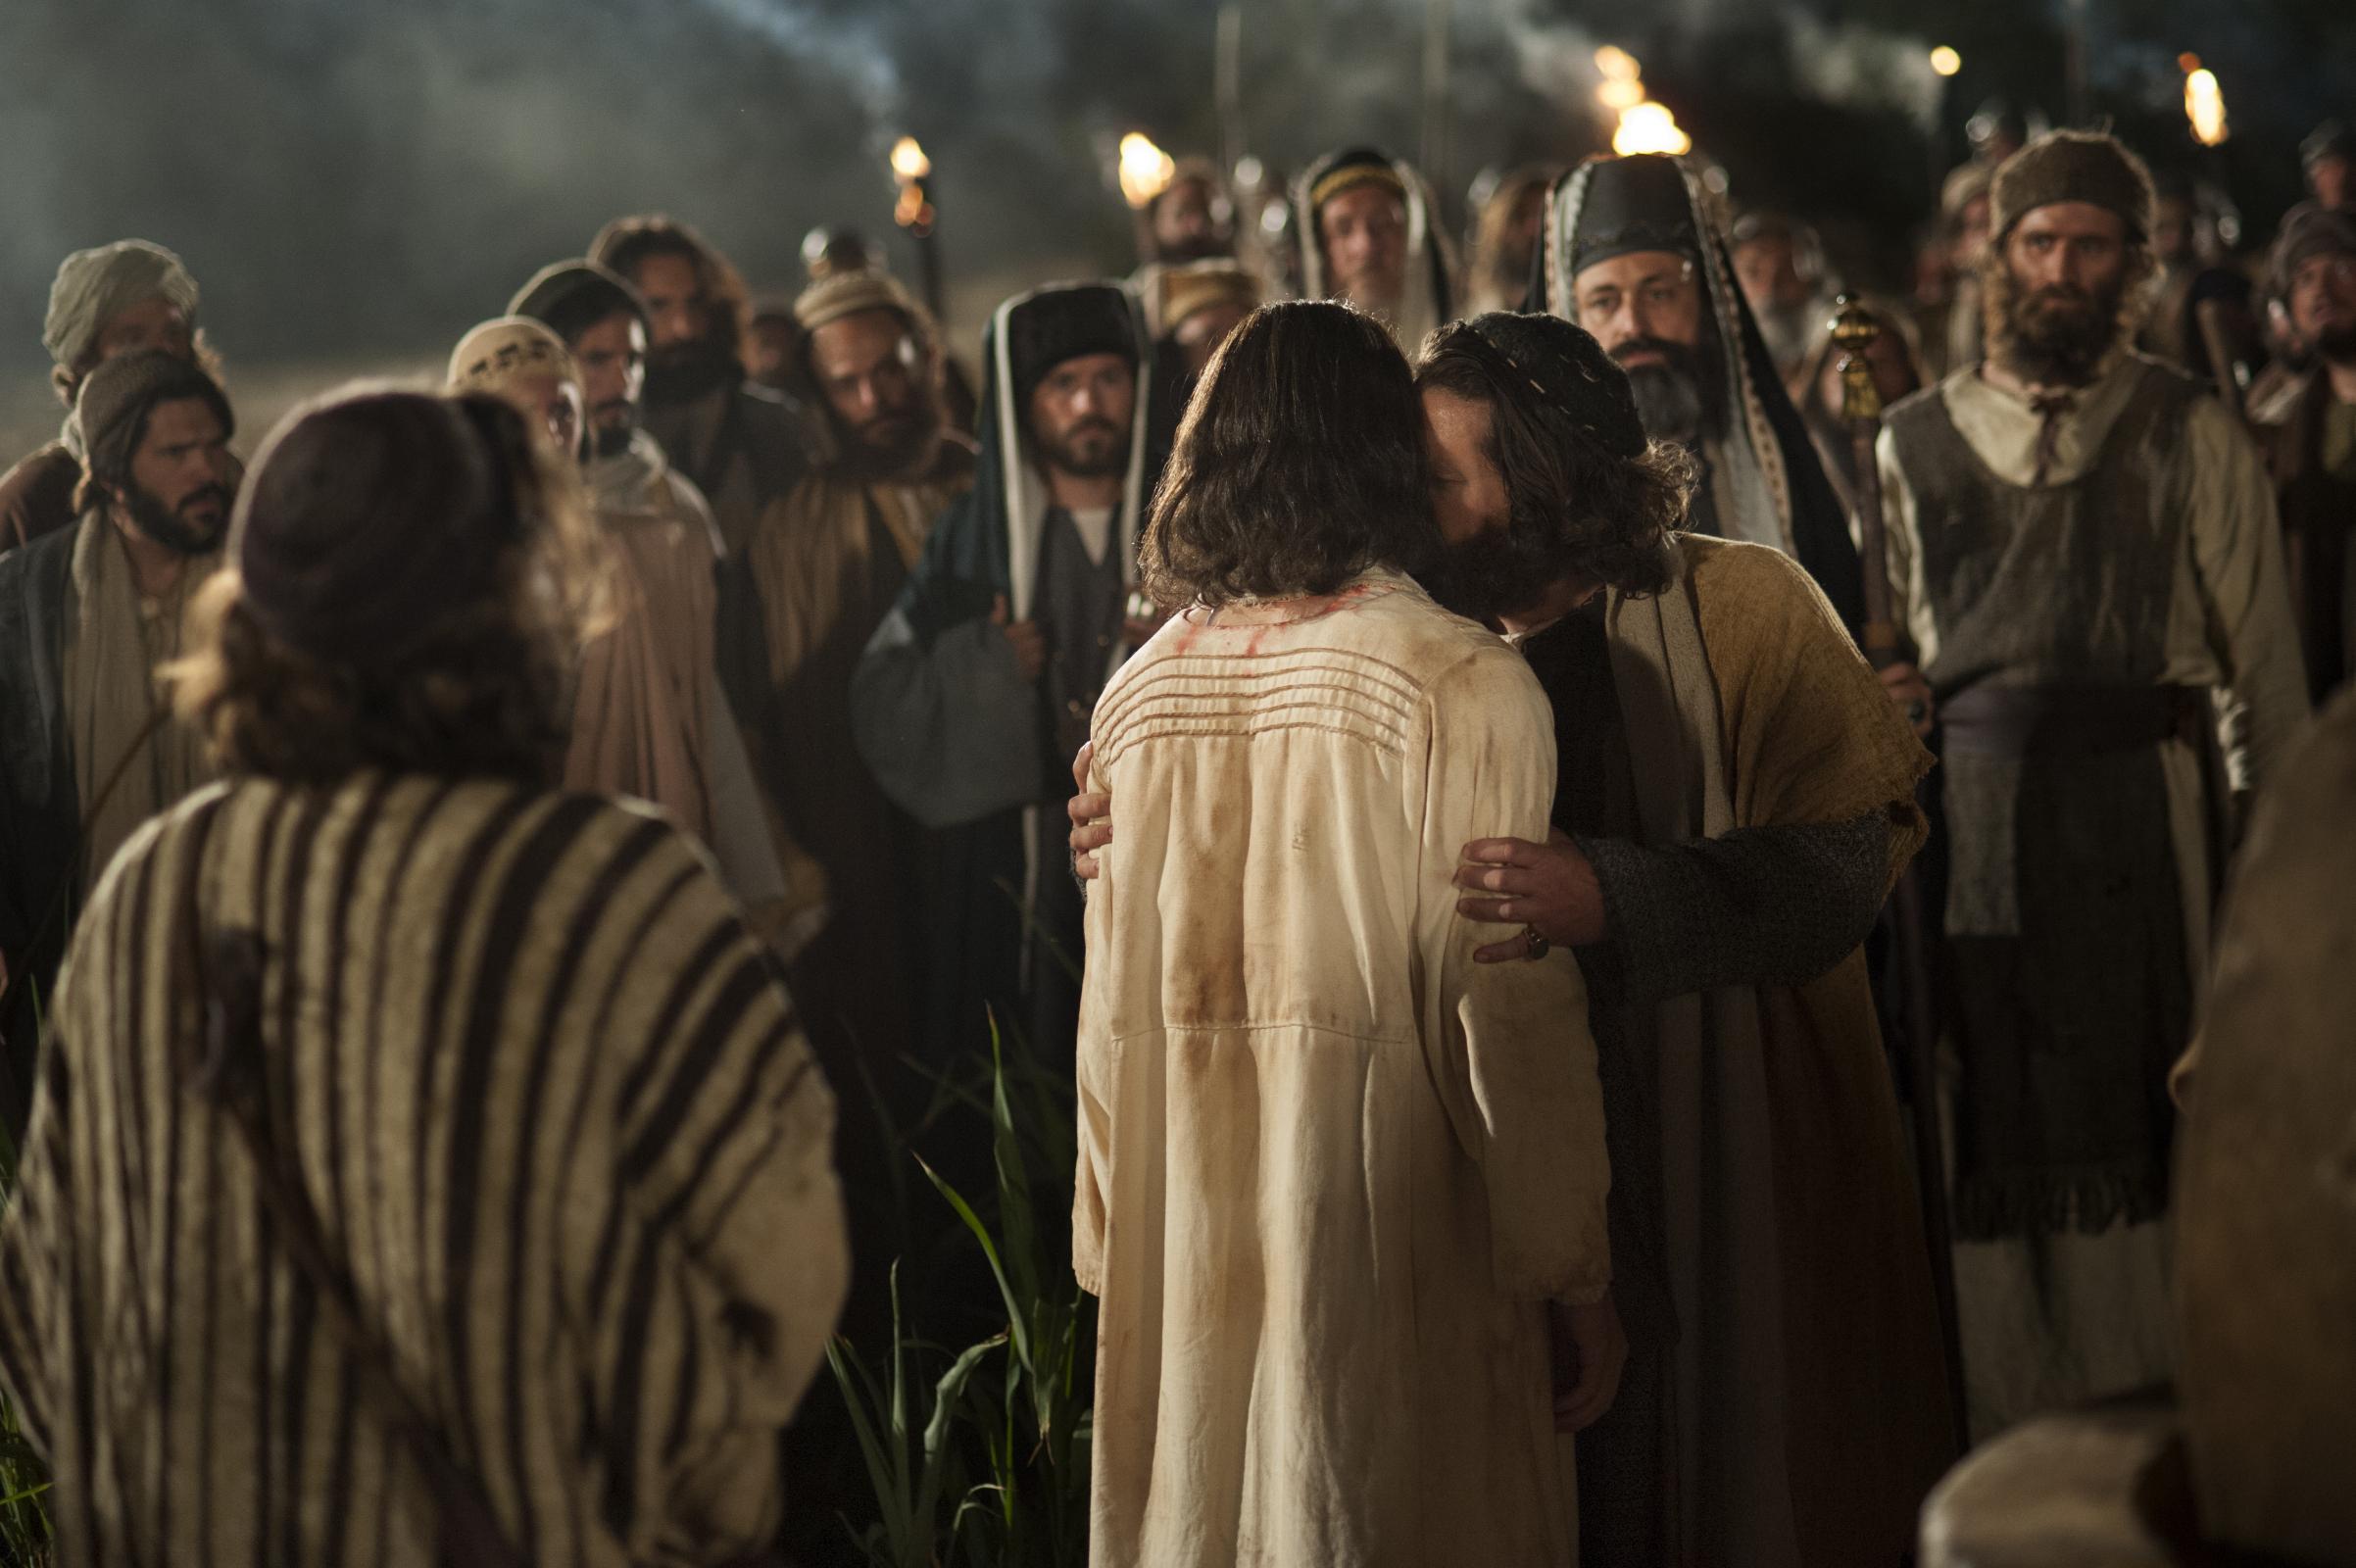 The Savior Suffers in Gethsemane - The Savior Suffers in Gethsemane